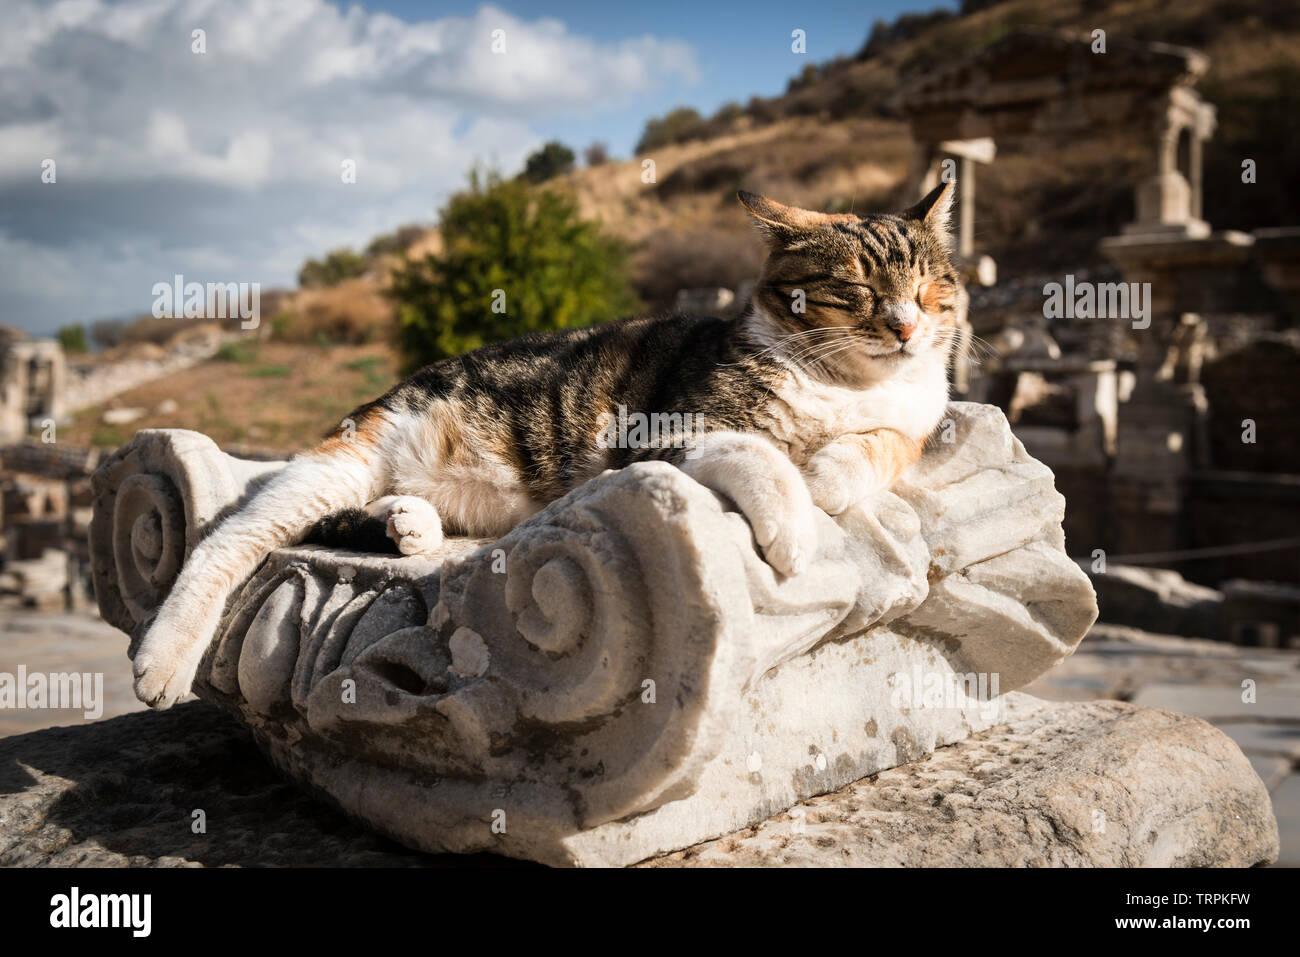 Stray cat basking on an ionic column in the sunlight, Ephesus ruins, Turkey Stock Photo